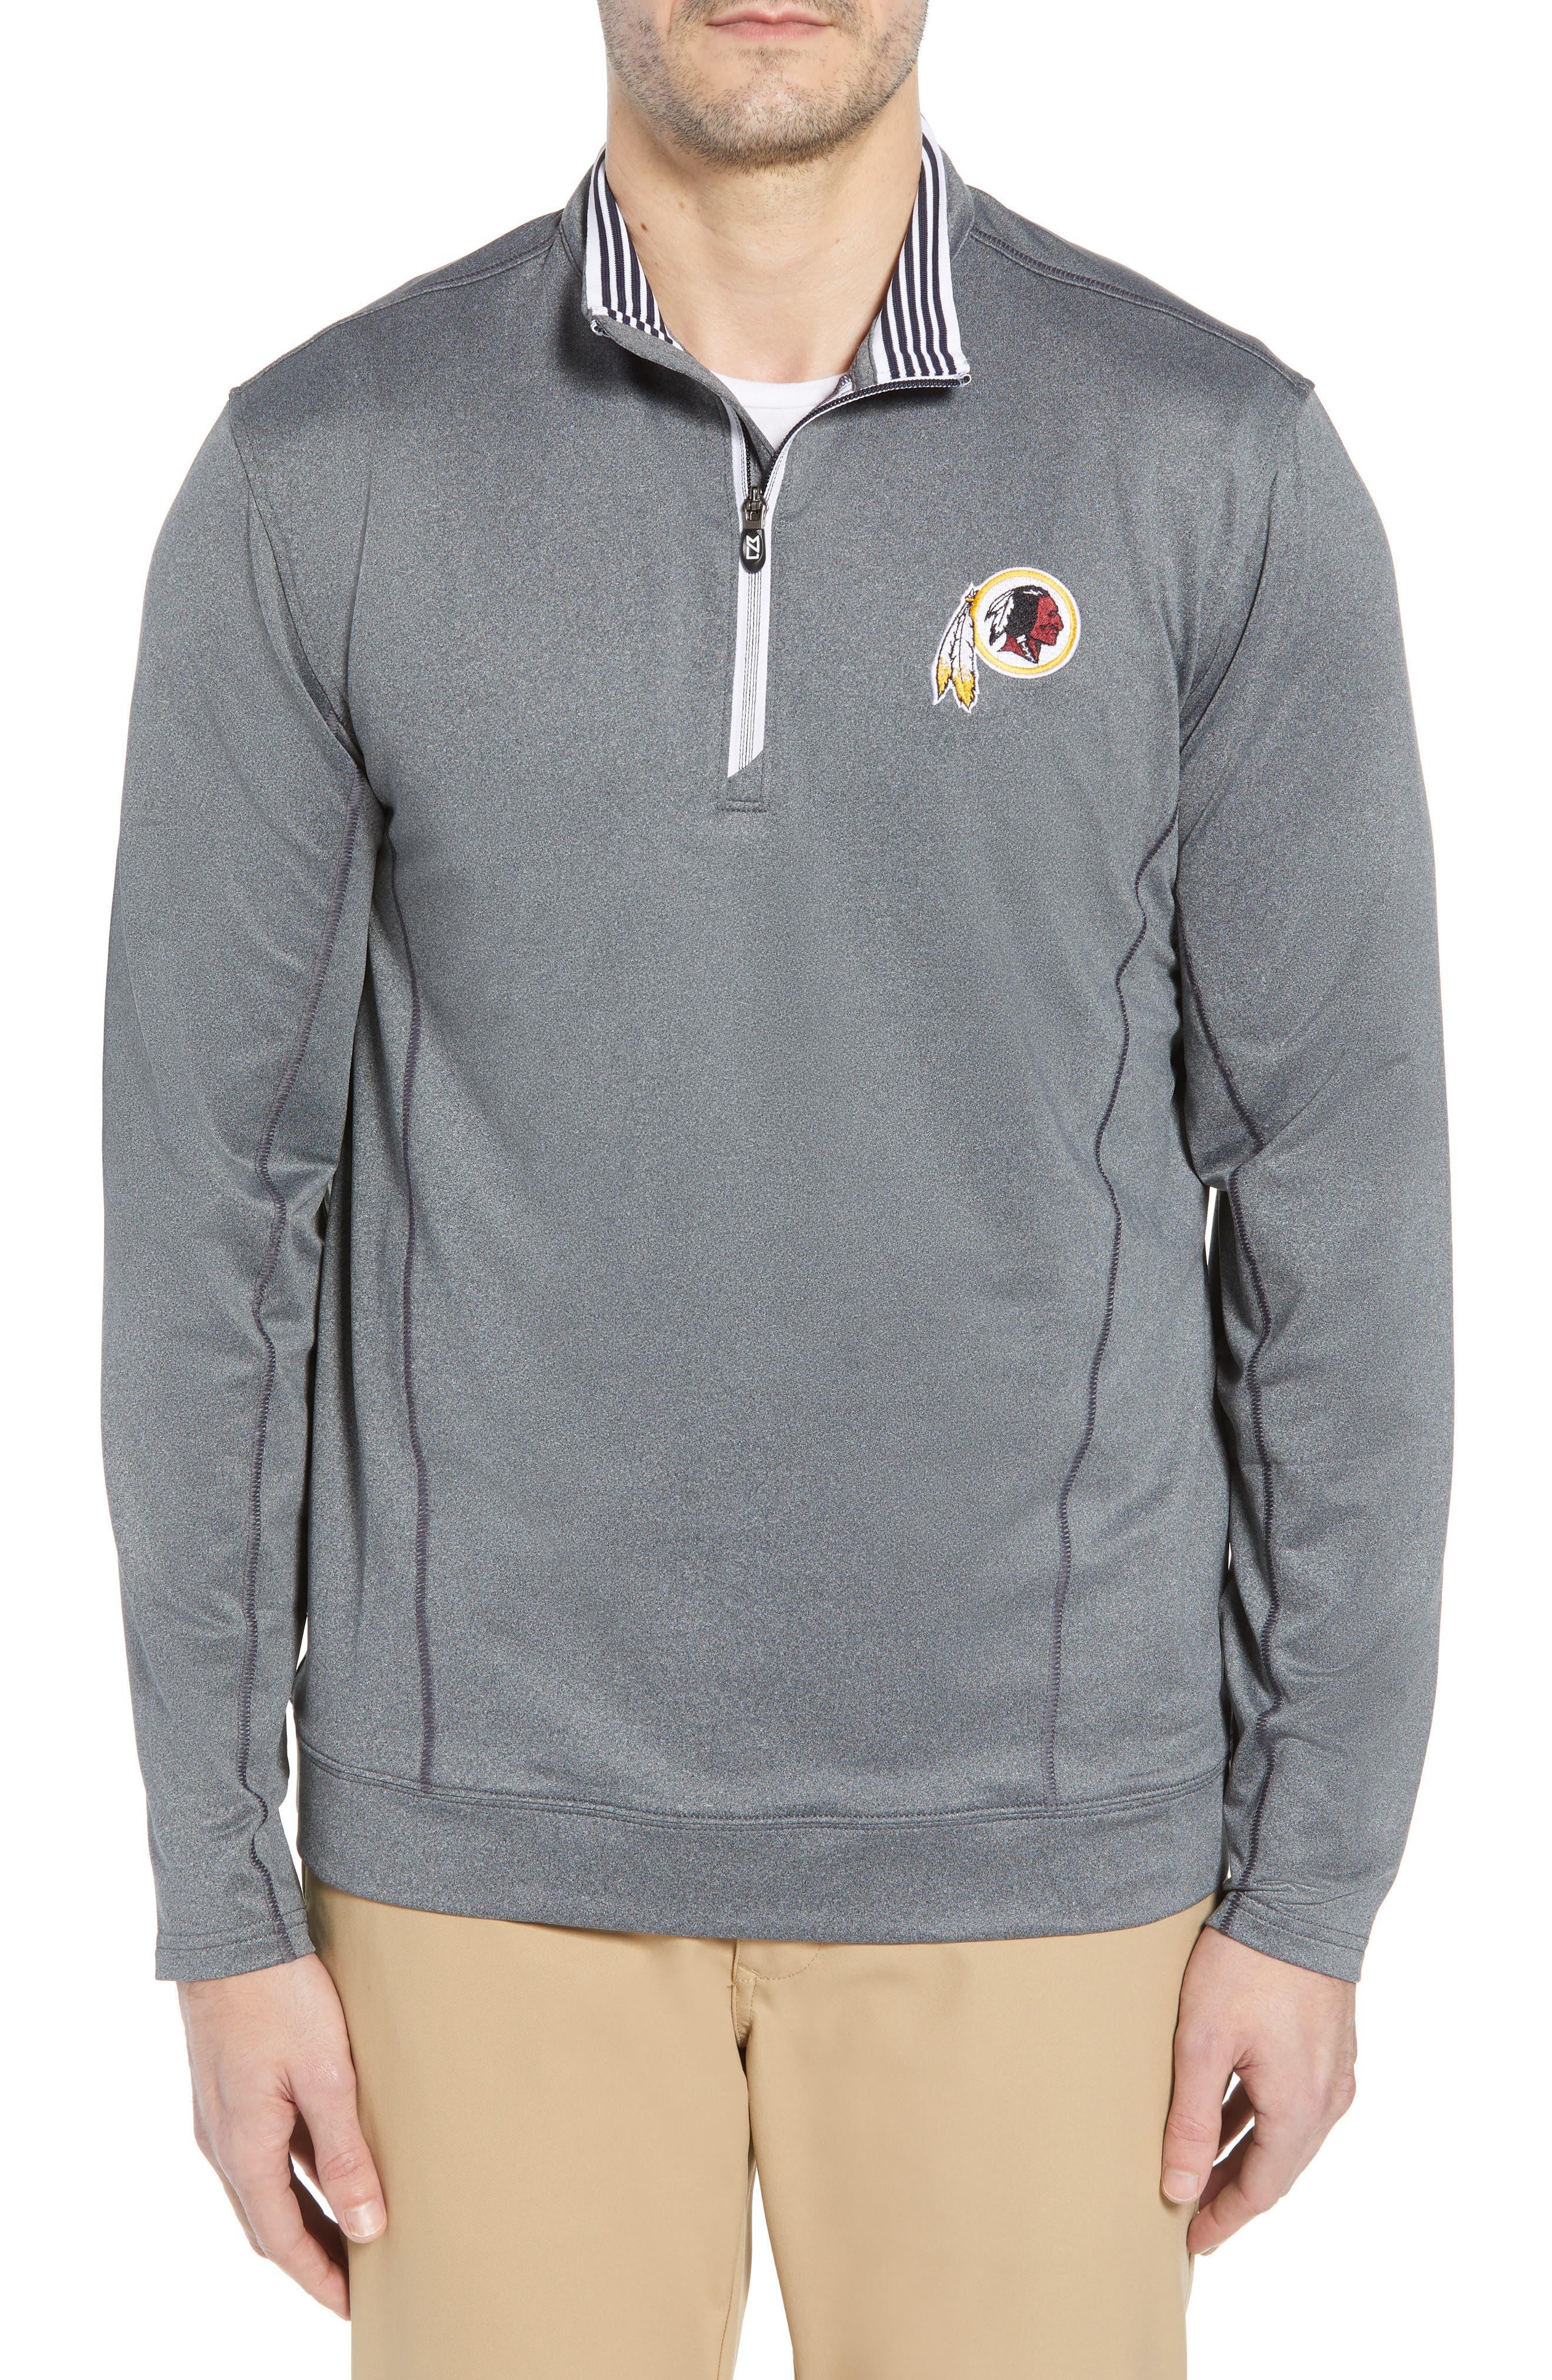 Endurance Washington DC NFL Team Regular Fit Pullover,                         Main,                         color, CHARCOAL HEATHER